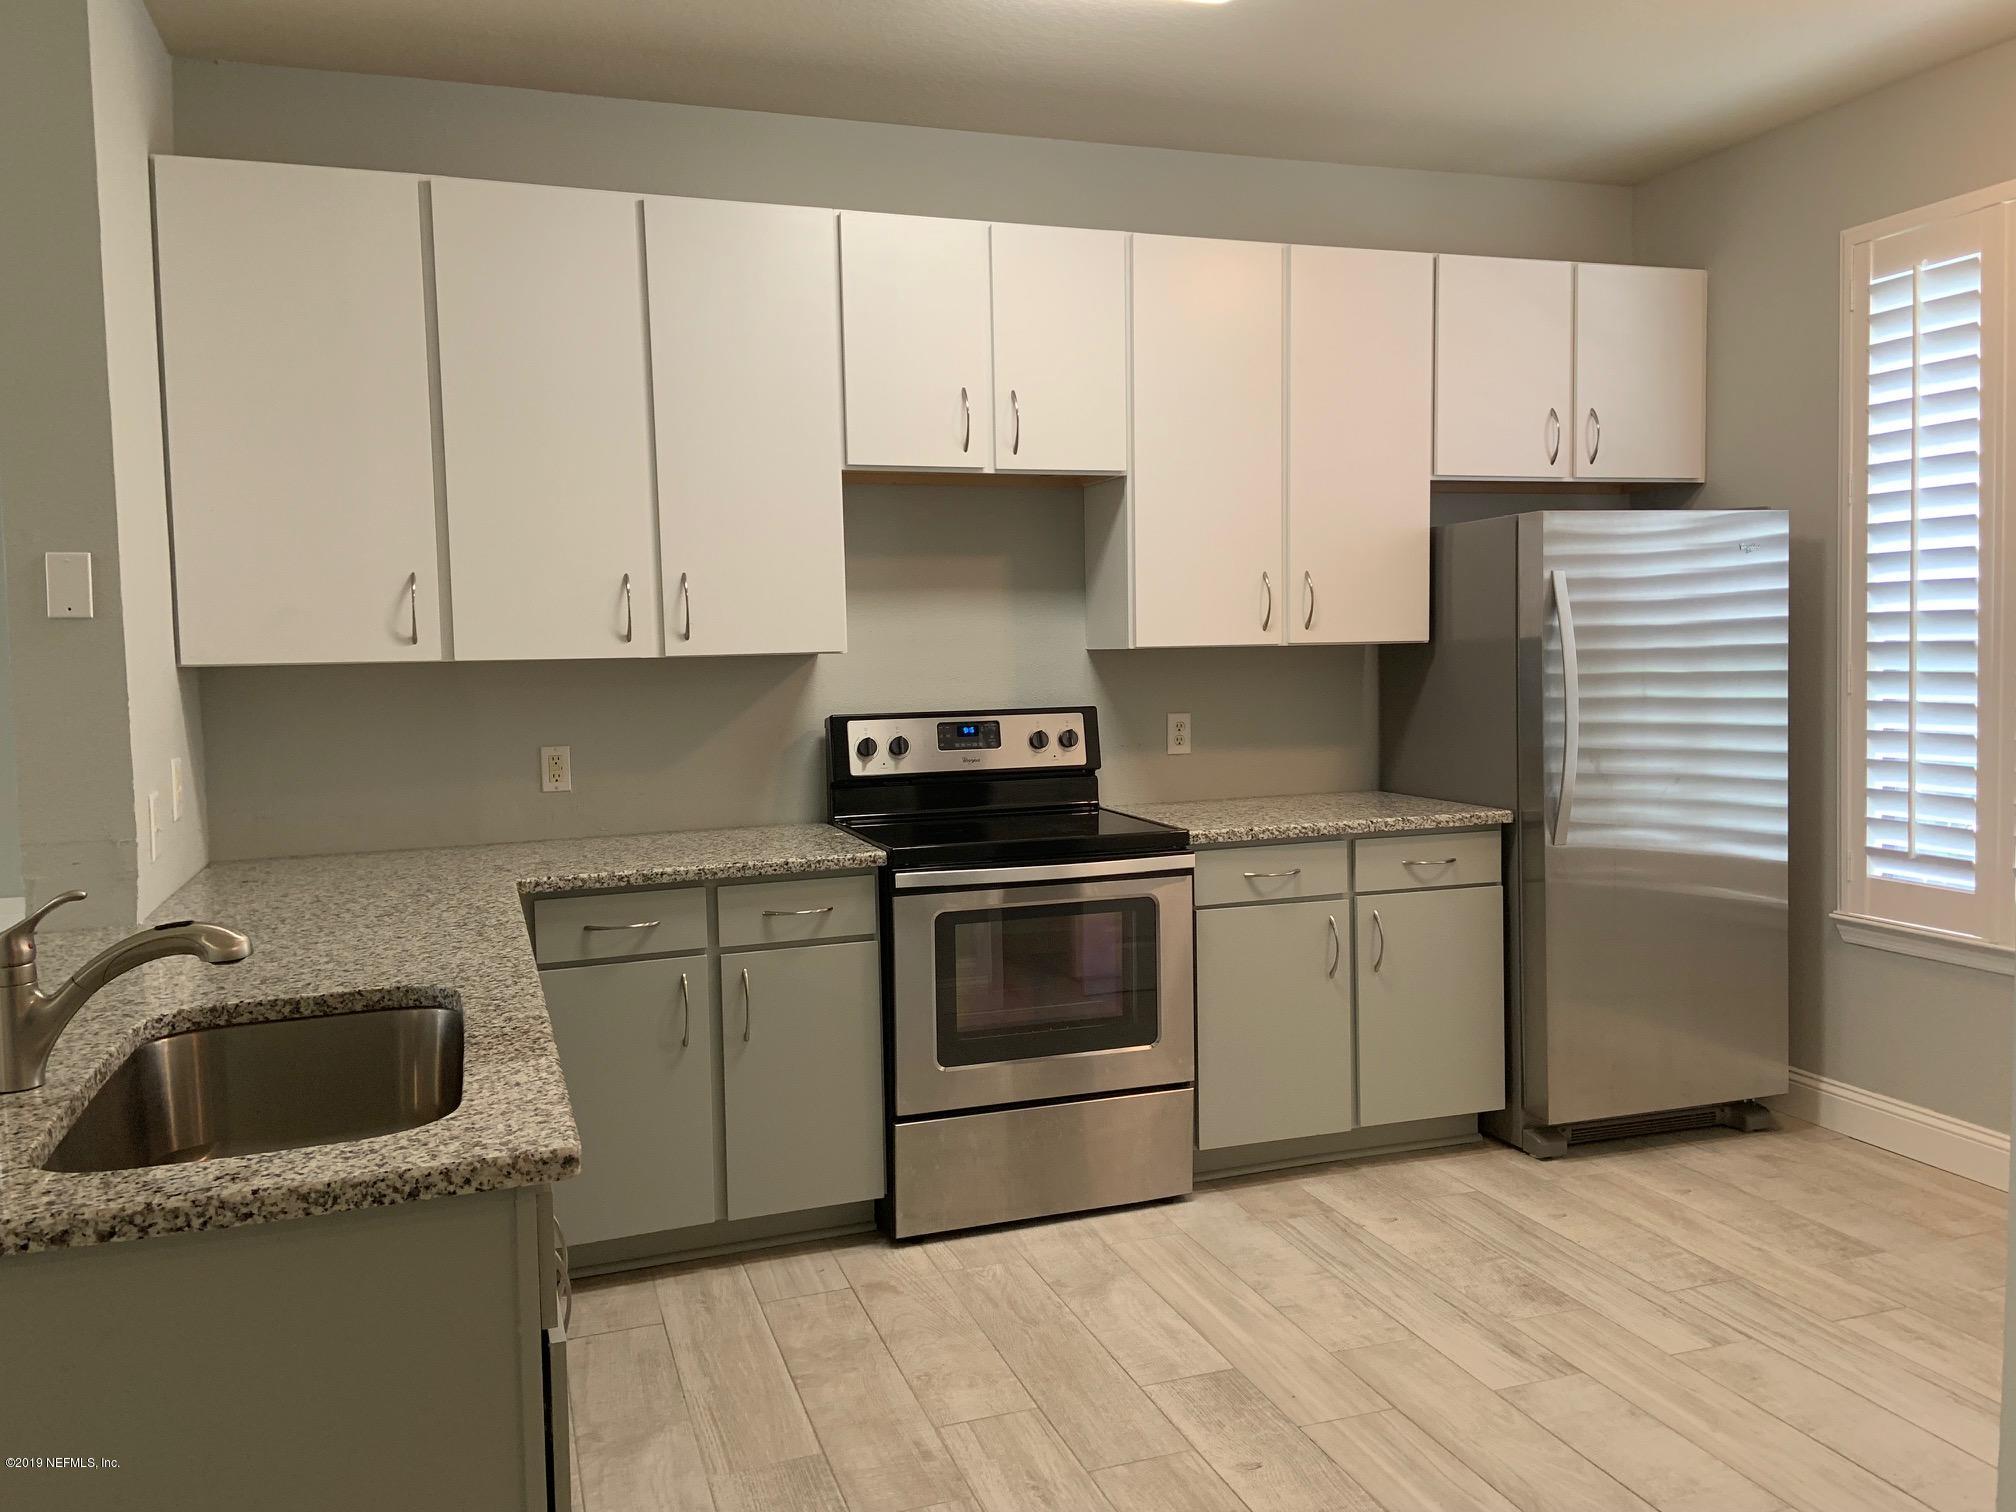 12700 BARTRAM PARK, JACKSONVILLE, FLORIDA 32258, 2 Bedrooms Bedrooms, ,2 BathroomsBathrooms,Condo,For sale,BARTRAM PARK,988228